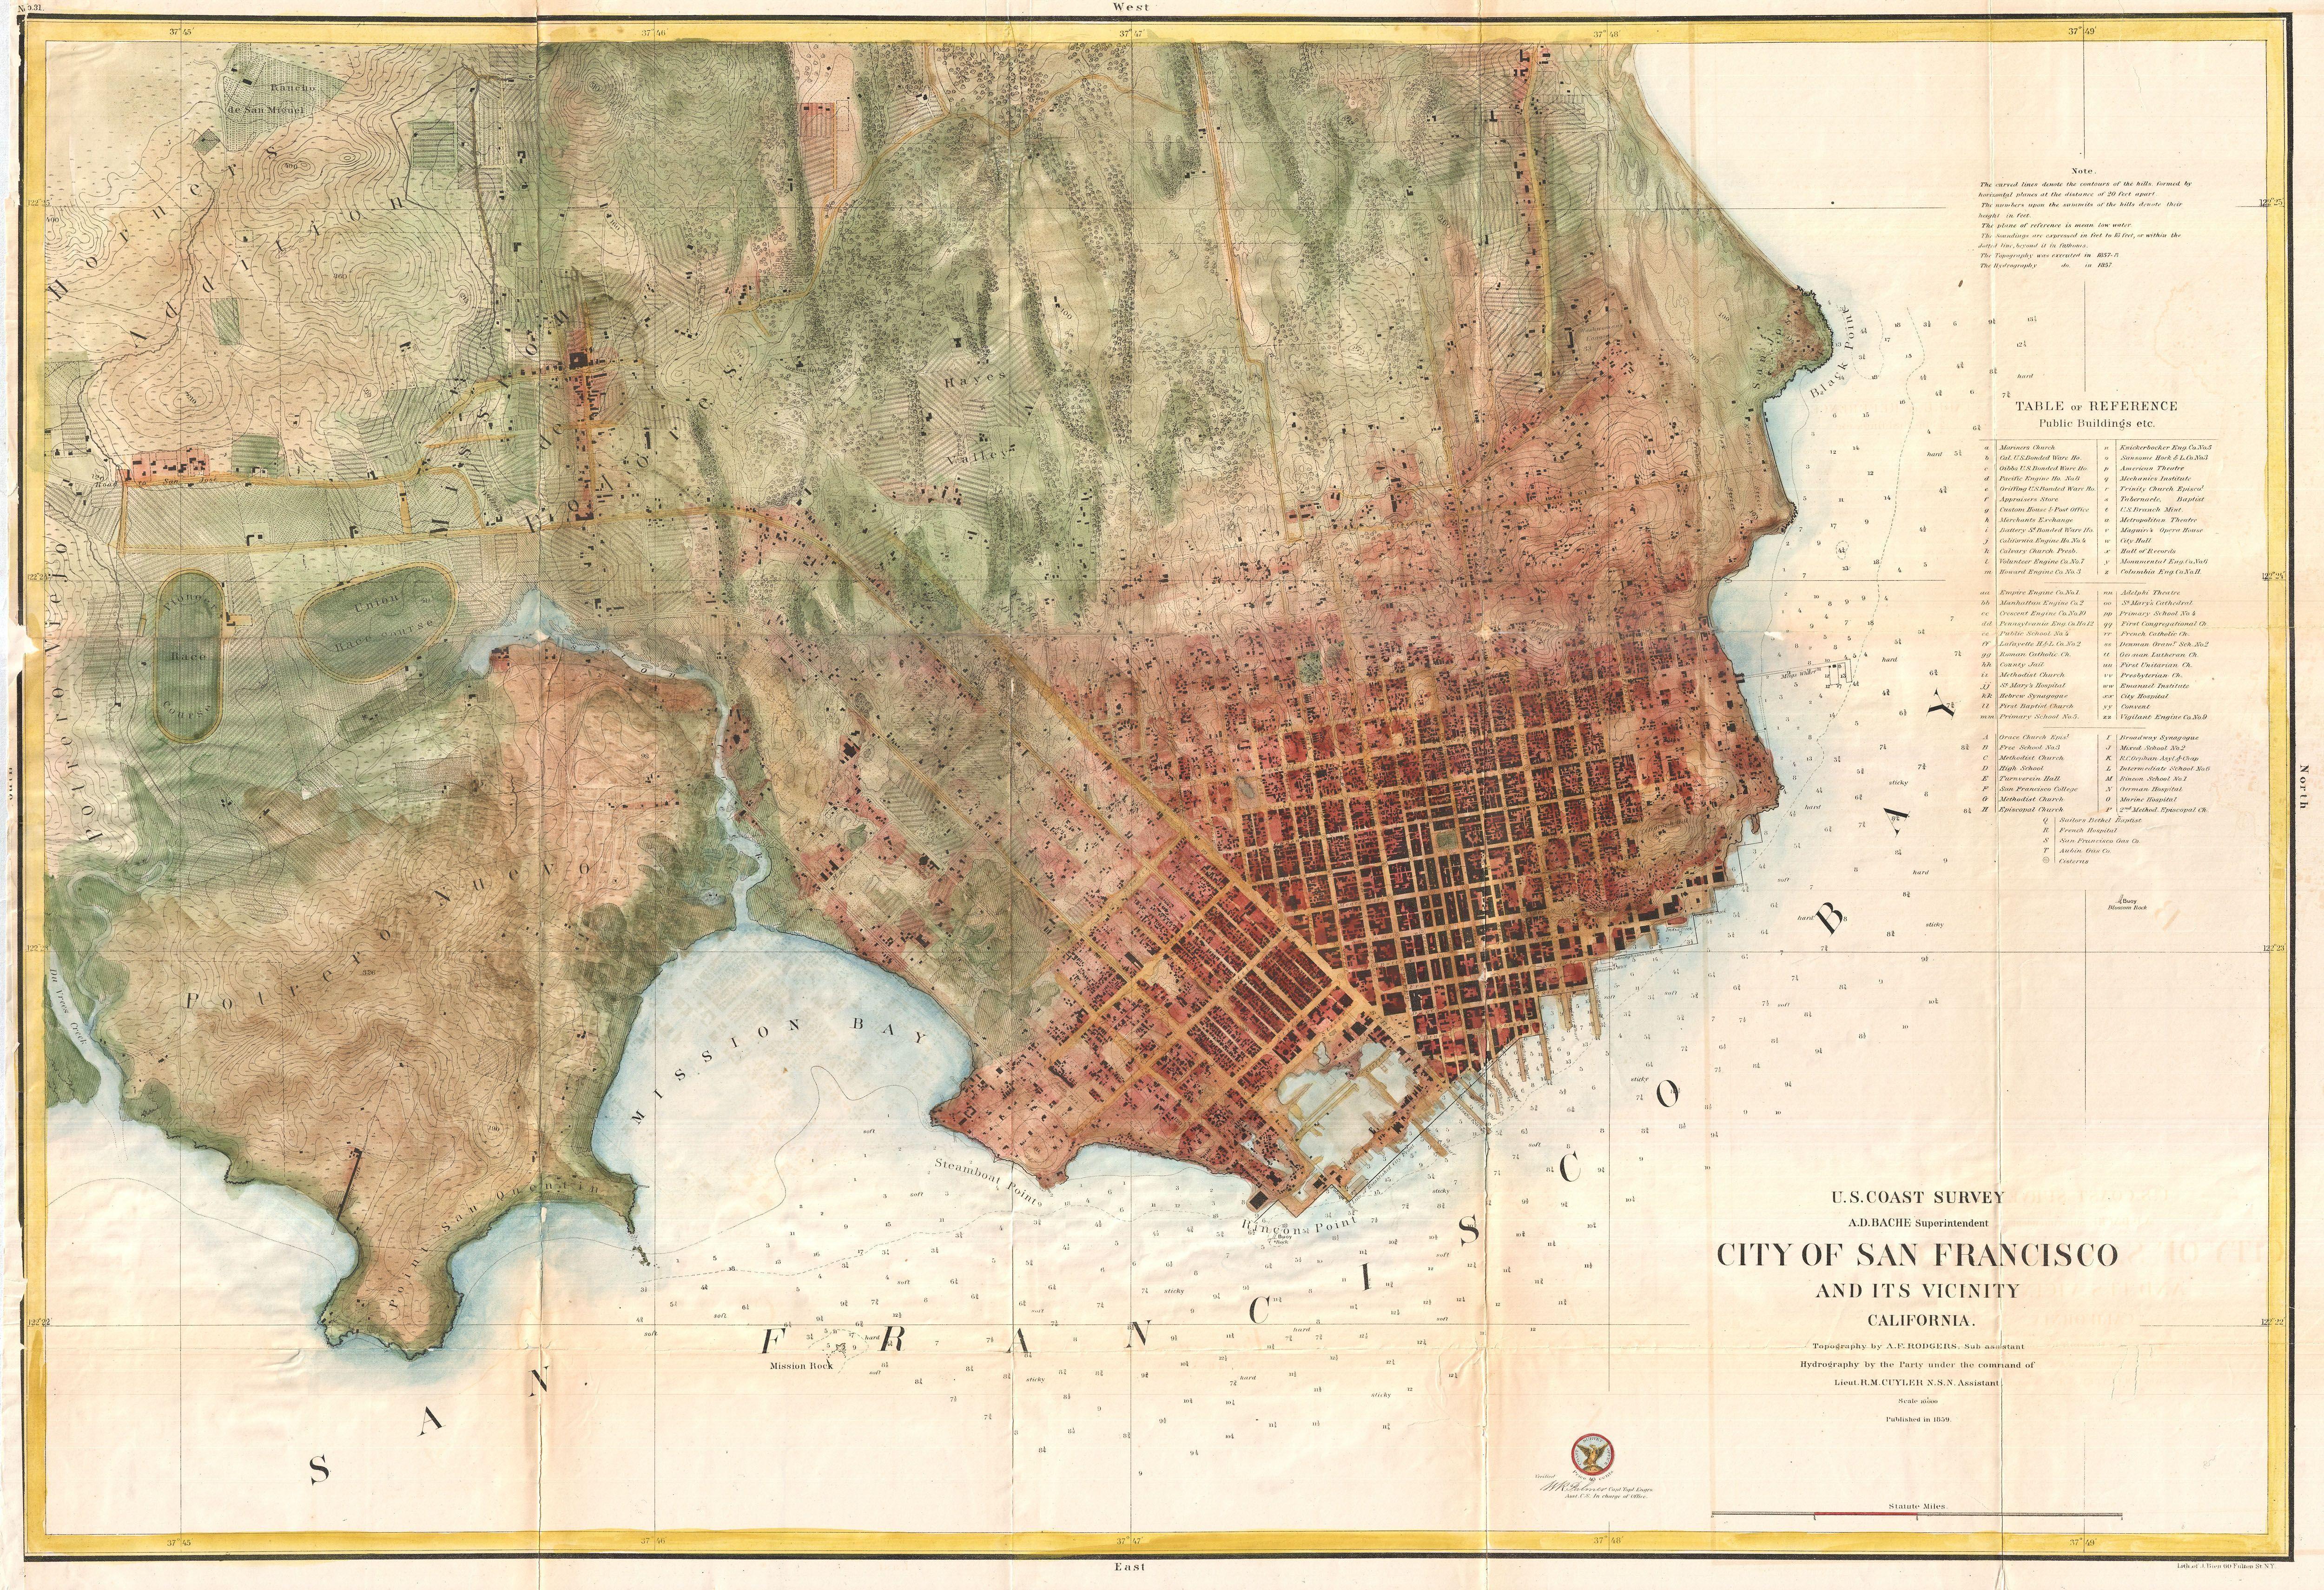 1858_U.S._Coast_Survey_Chart_or_Map_of_San_Francisco,_Califorina_-_Geographicus_-_SanFrancisco uscs